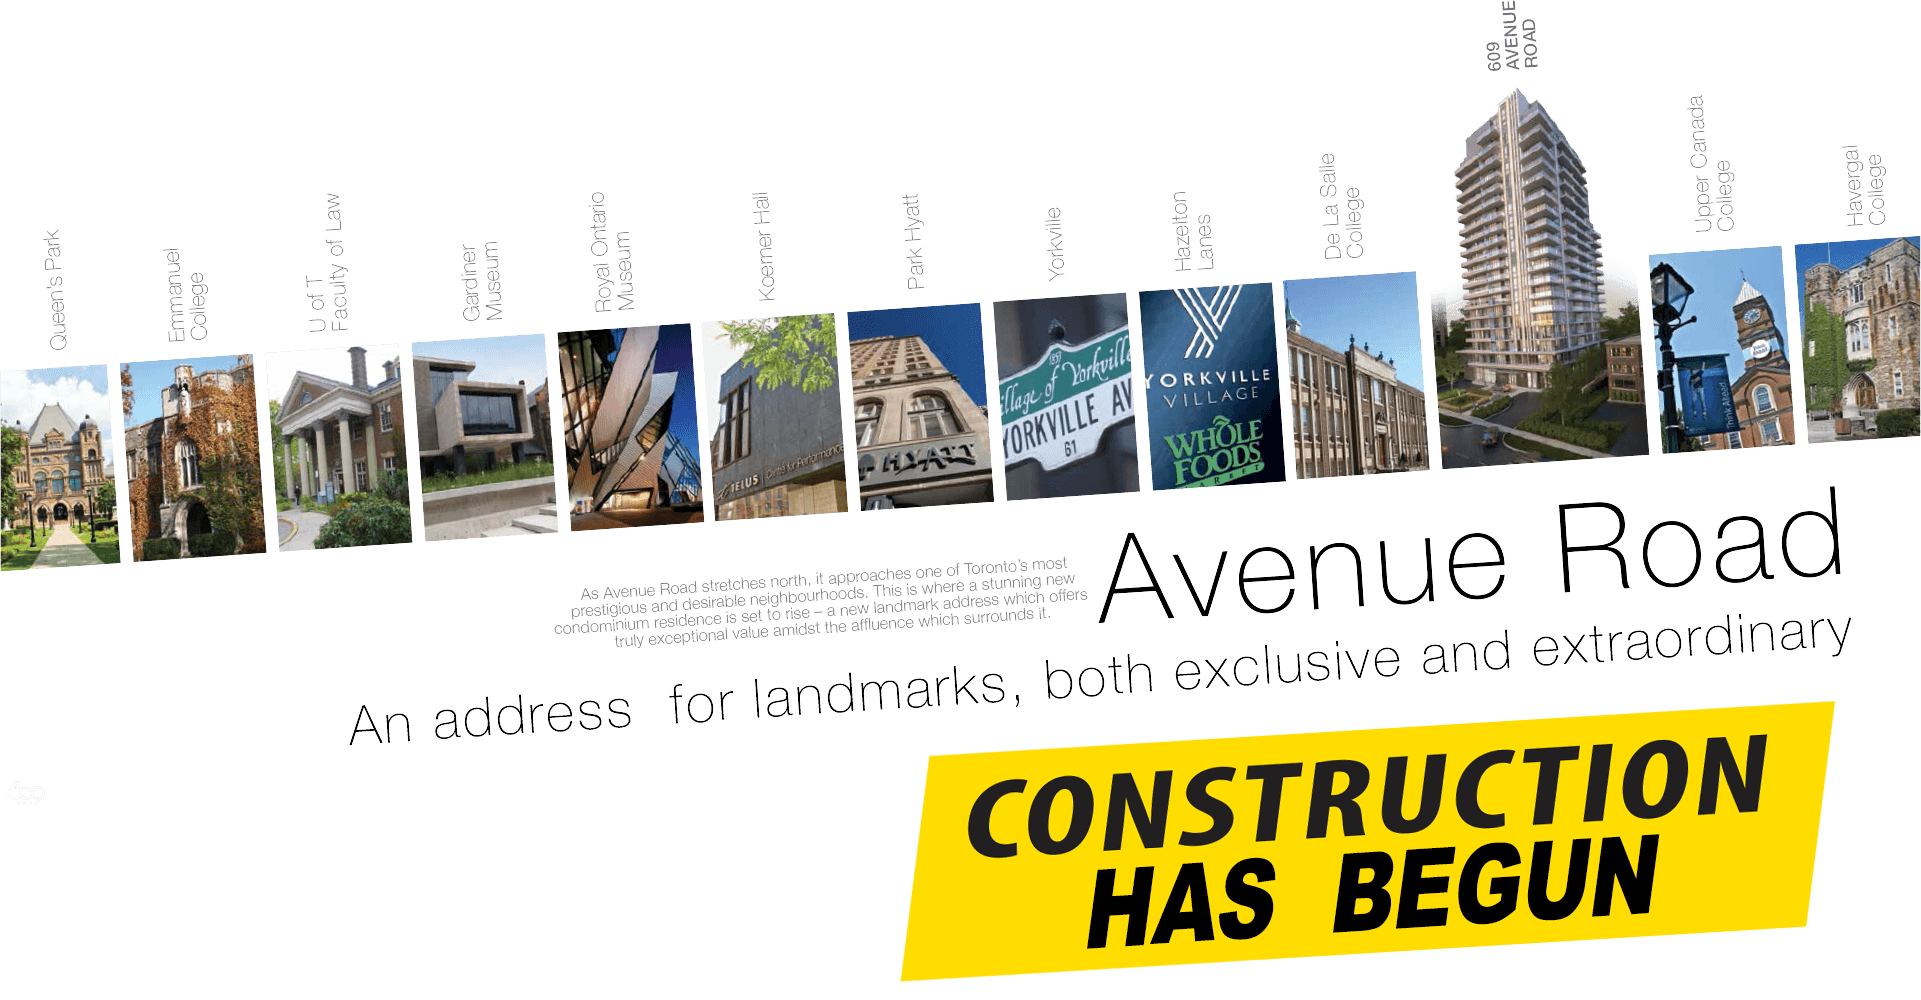 Avenue Road amenities